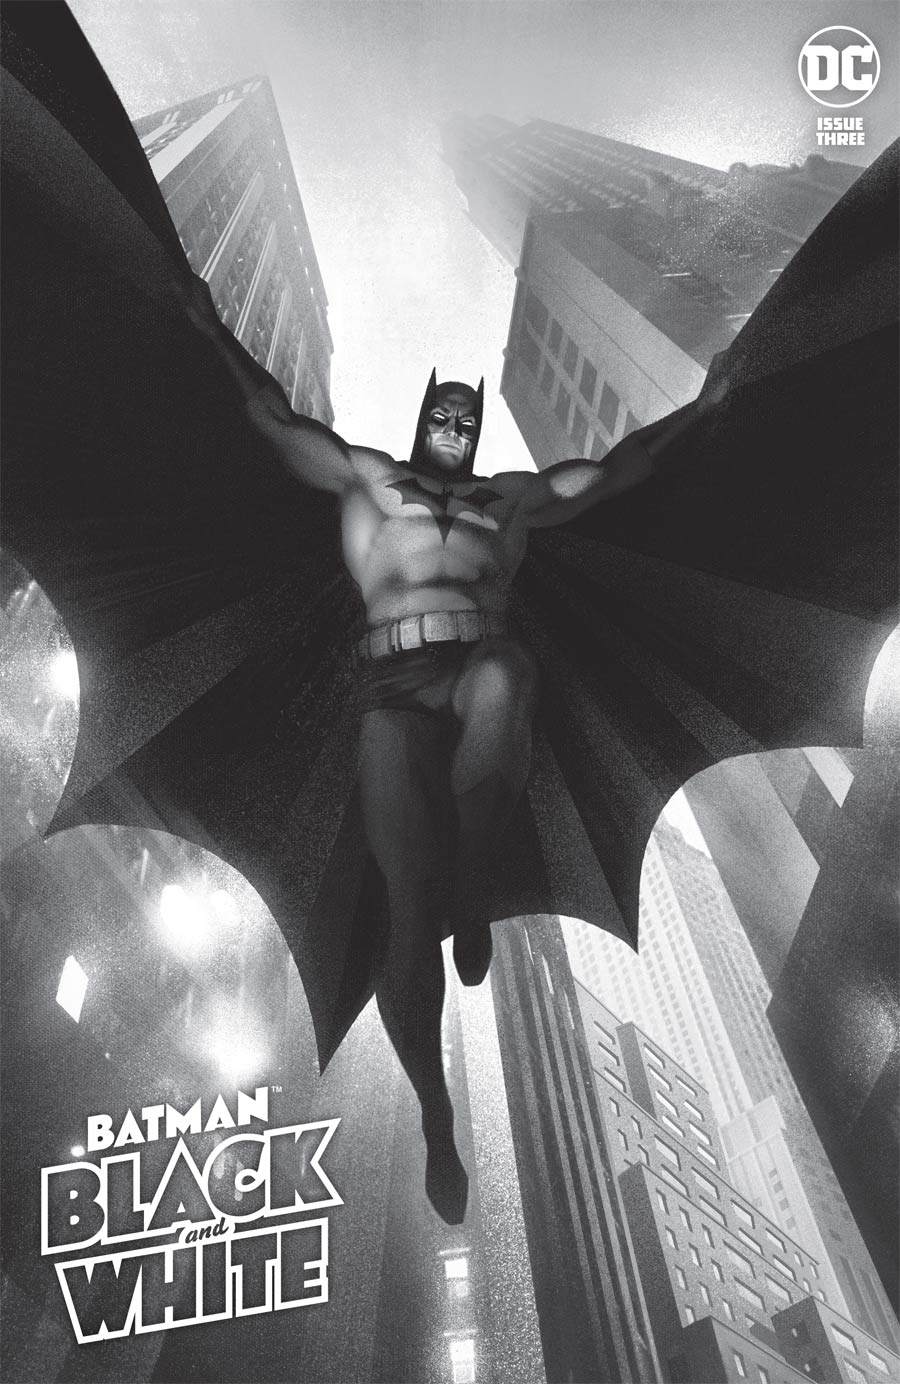 Batman Black & White Vol 3 #3 Cover A Regular Joshua Middleton Cover